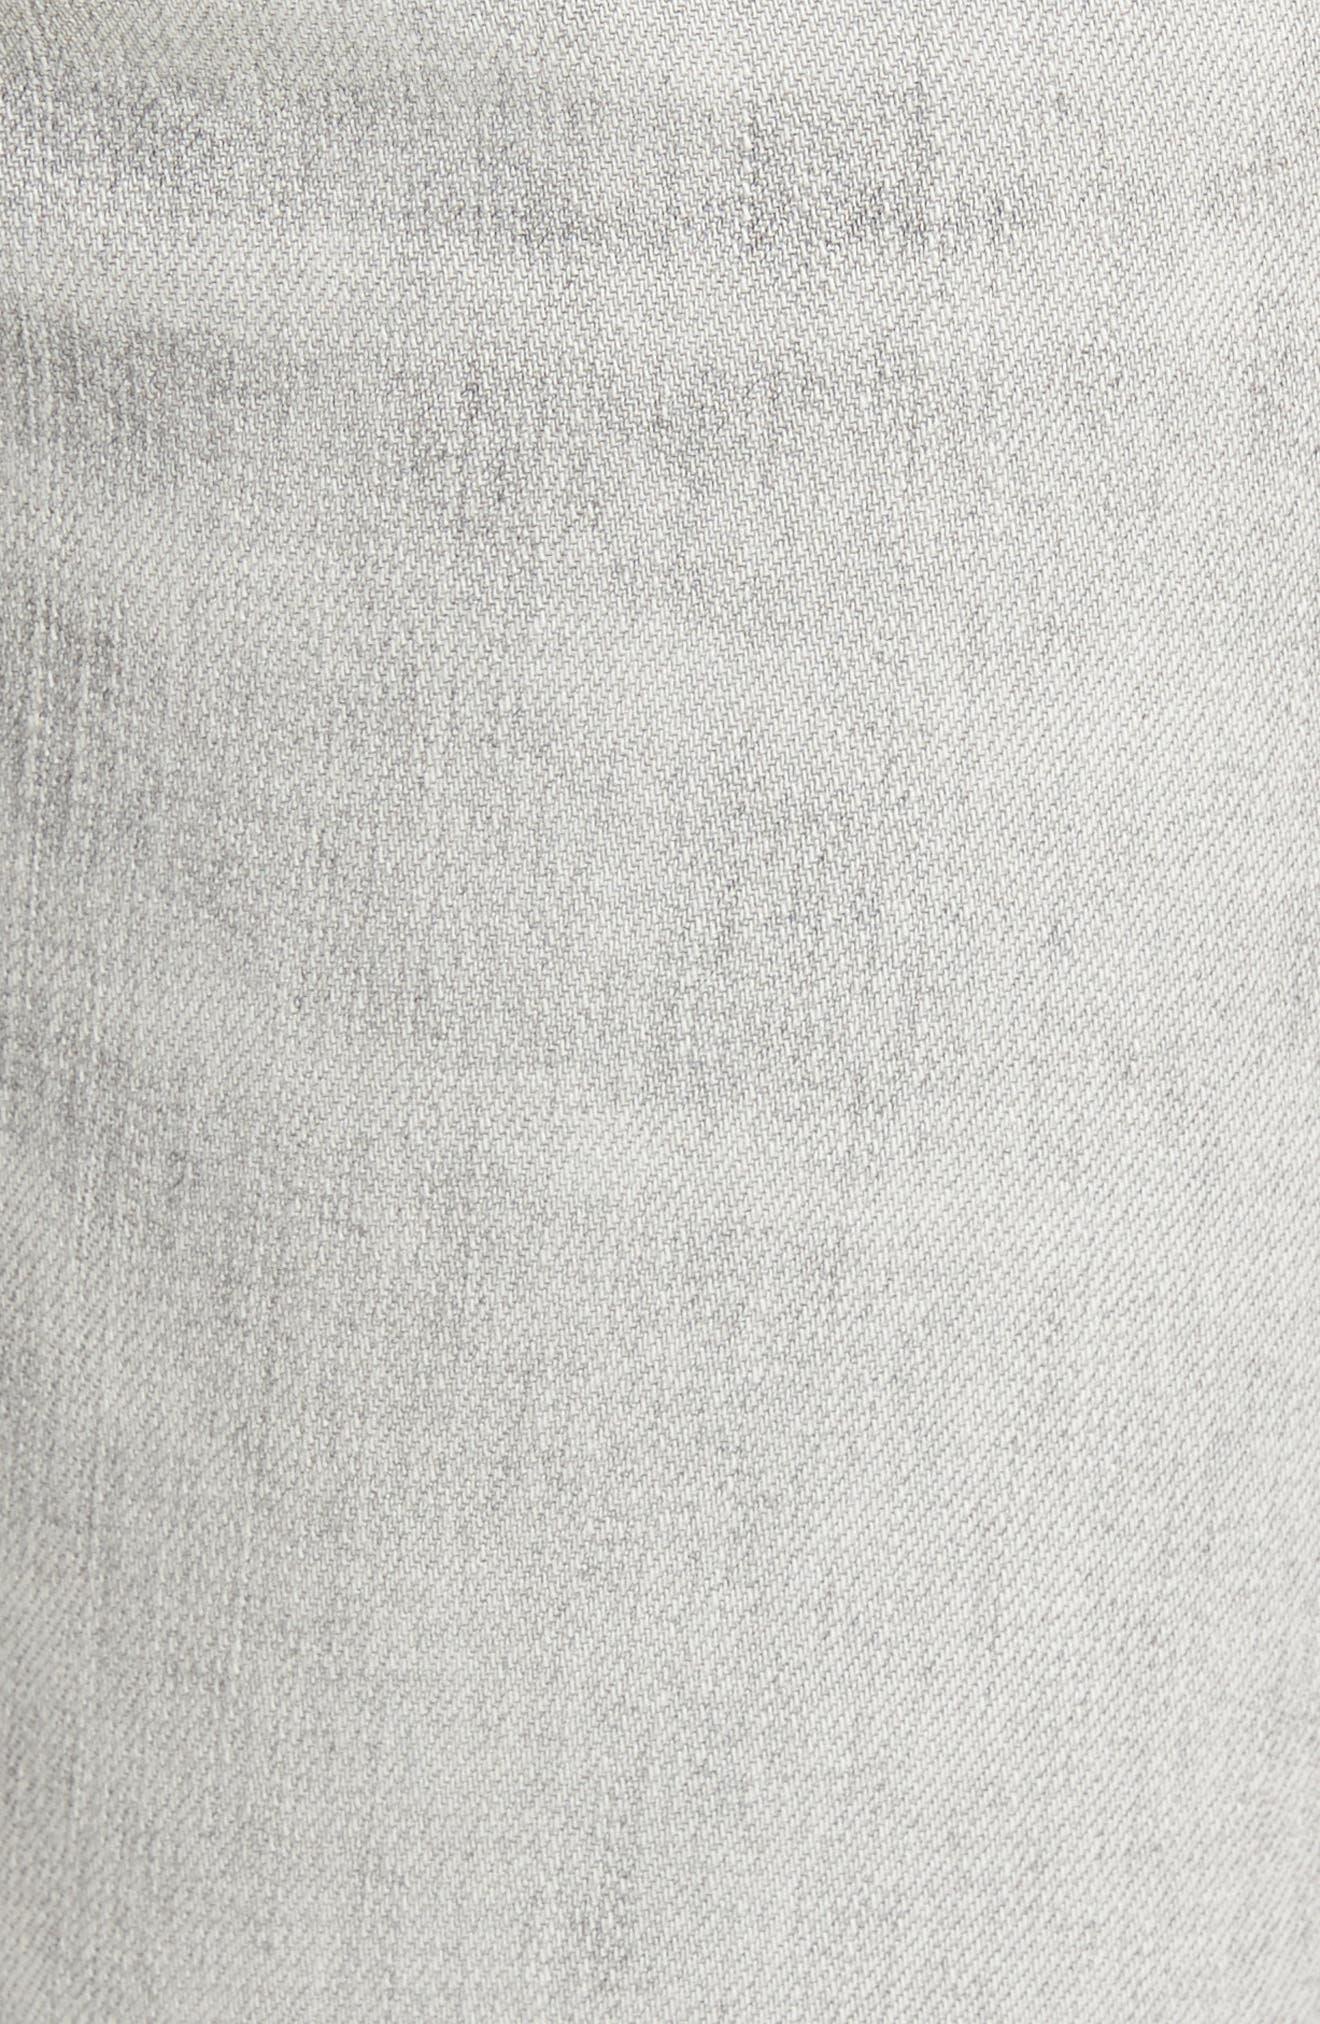 Sophie High Waist Skinny Jeans,                             Alternate thumbnail 5, color,                             Portland Destruct